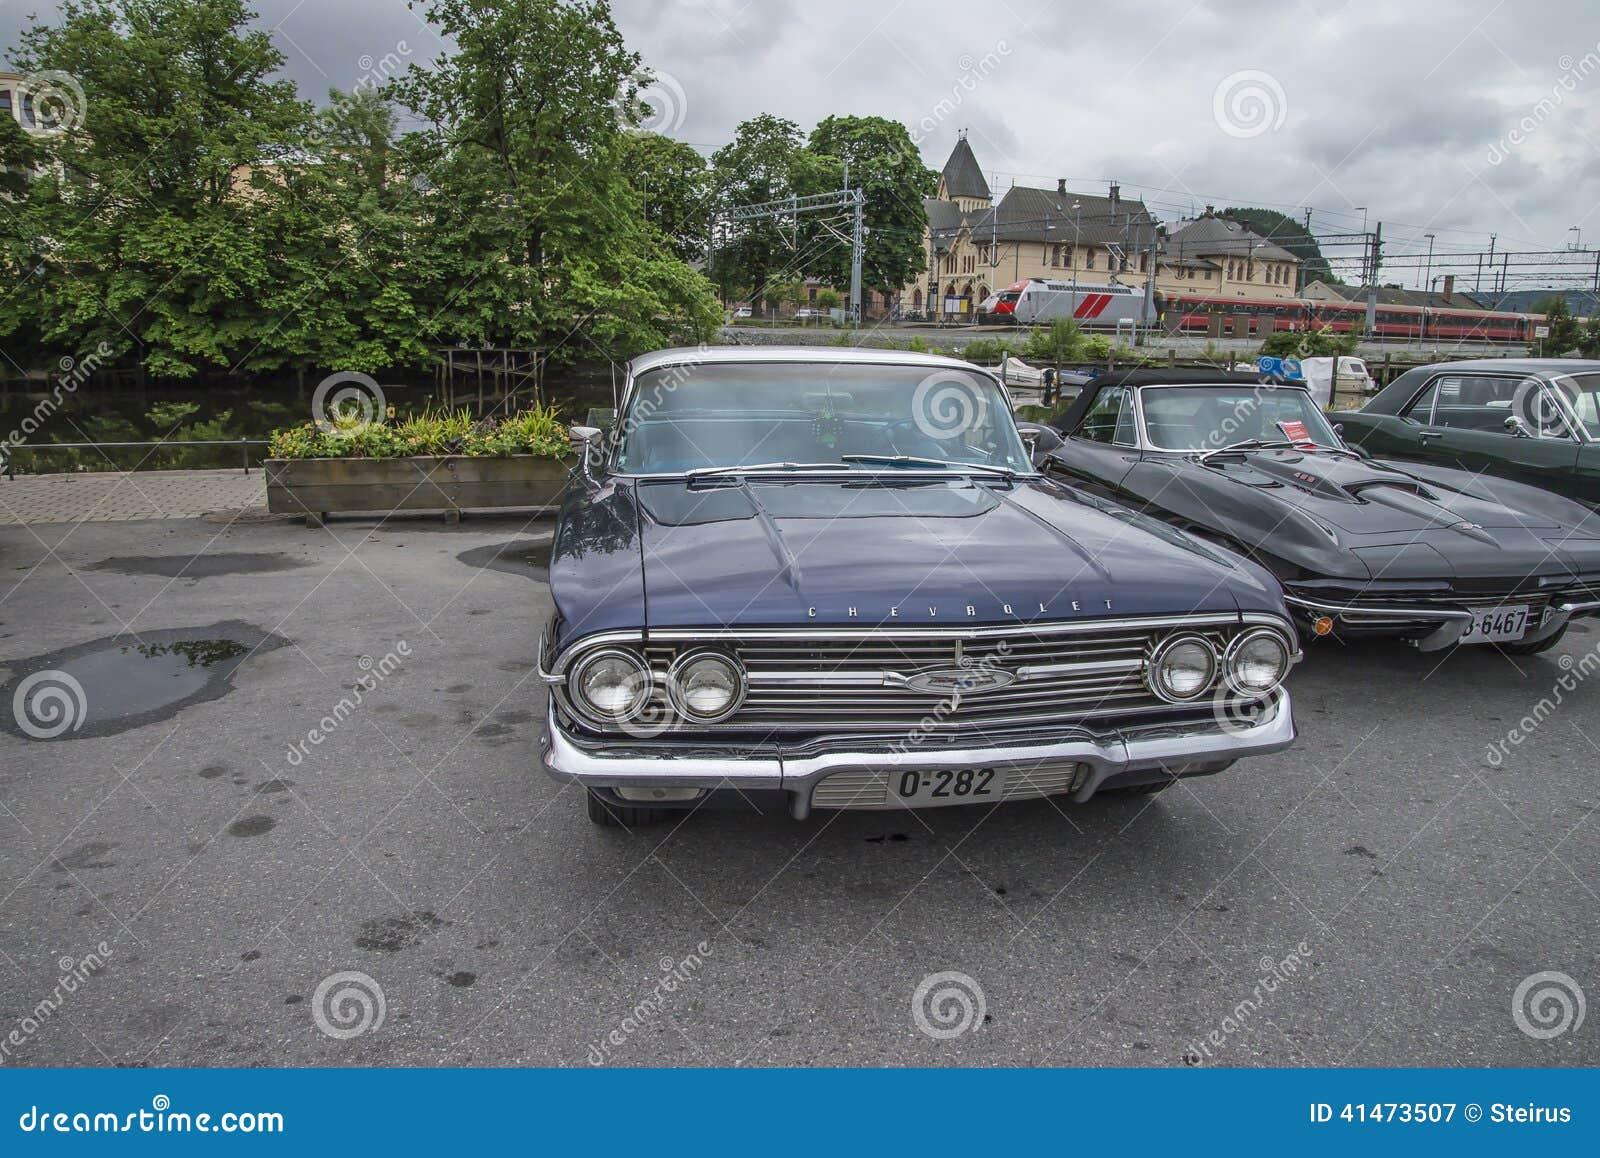 1960 Chevrolet Impala 4 Door Hardtop Sedan Editorial Photography